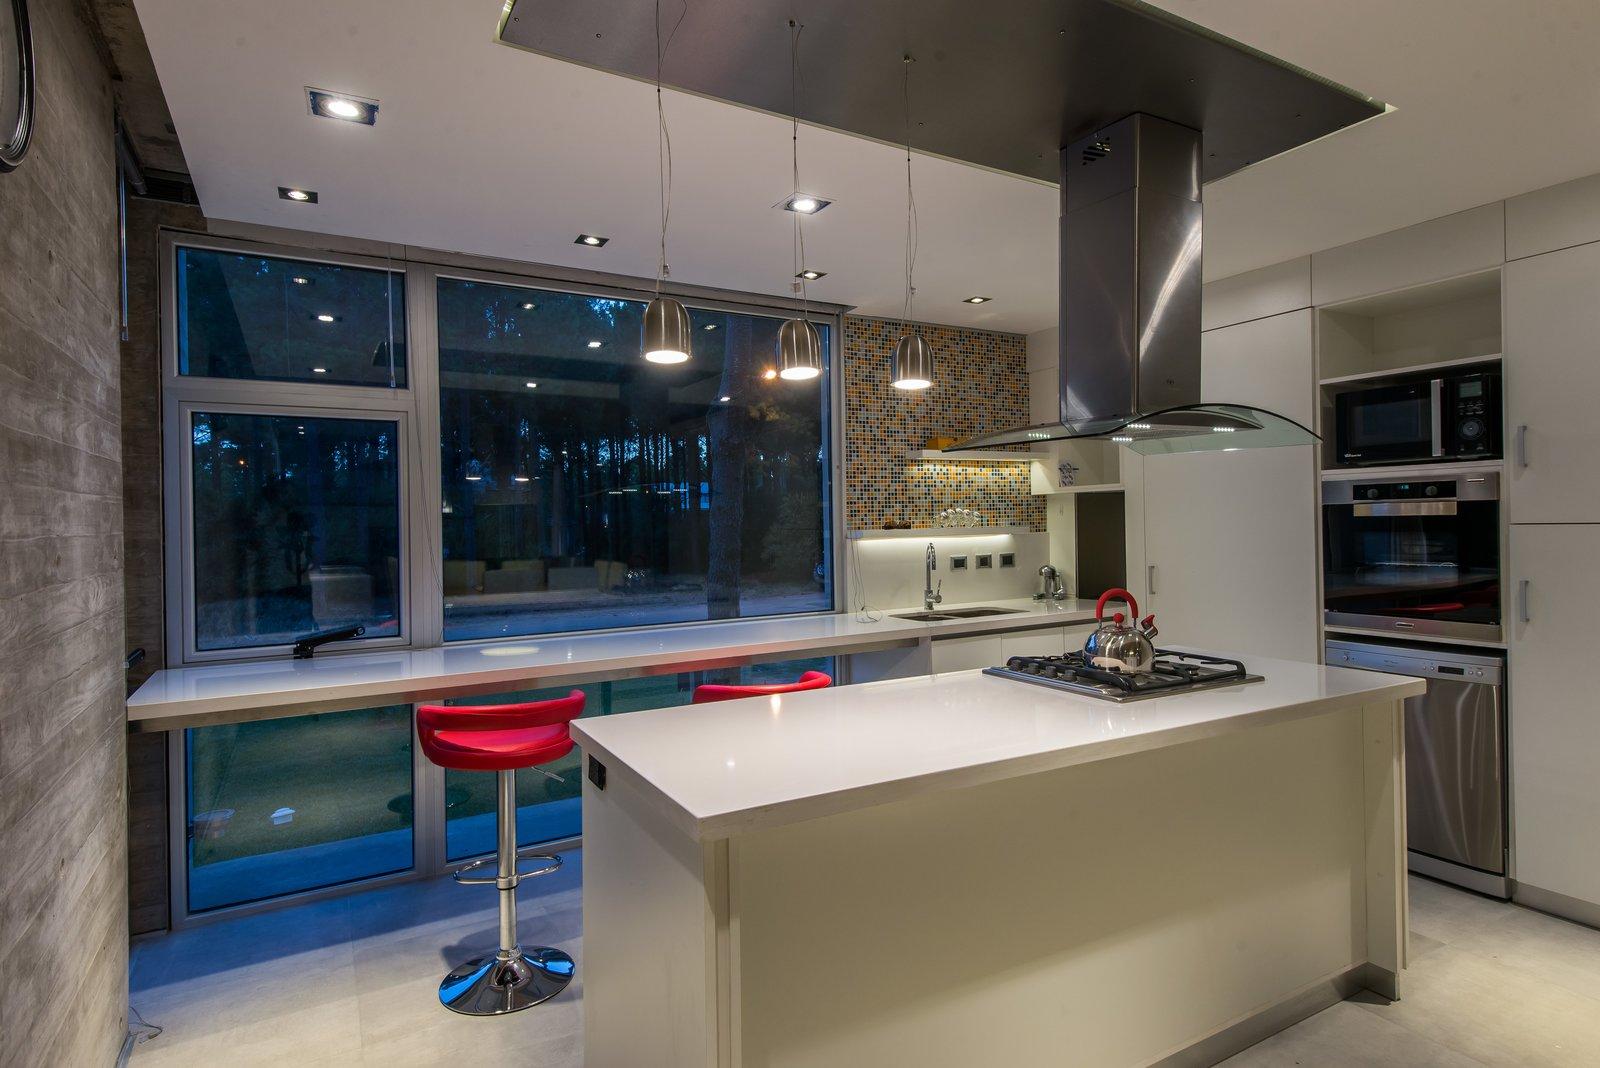 Tagged: Kitchen, Quartzite Counter, White Cabinet, Porcelain Tile Floor, Mosaic Tile Backsplashe, Wall Oven, Ceiling Lighting, Refrigerator, Cooktops, Drop In Sink, Microwave, and Dishwasher.  Casa Batin by Estudio Galera